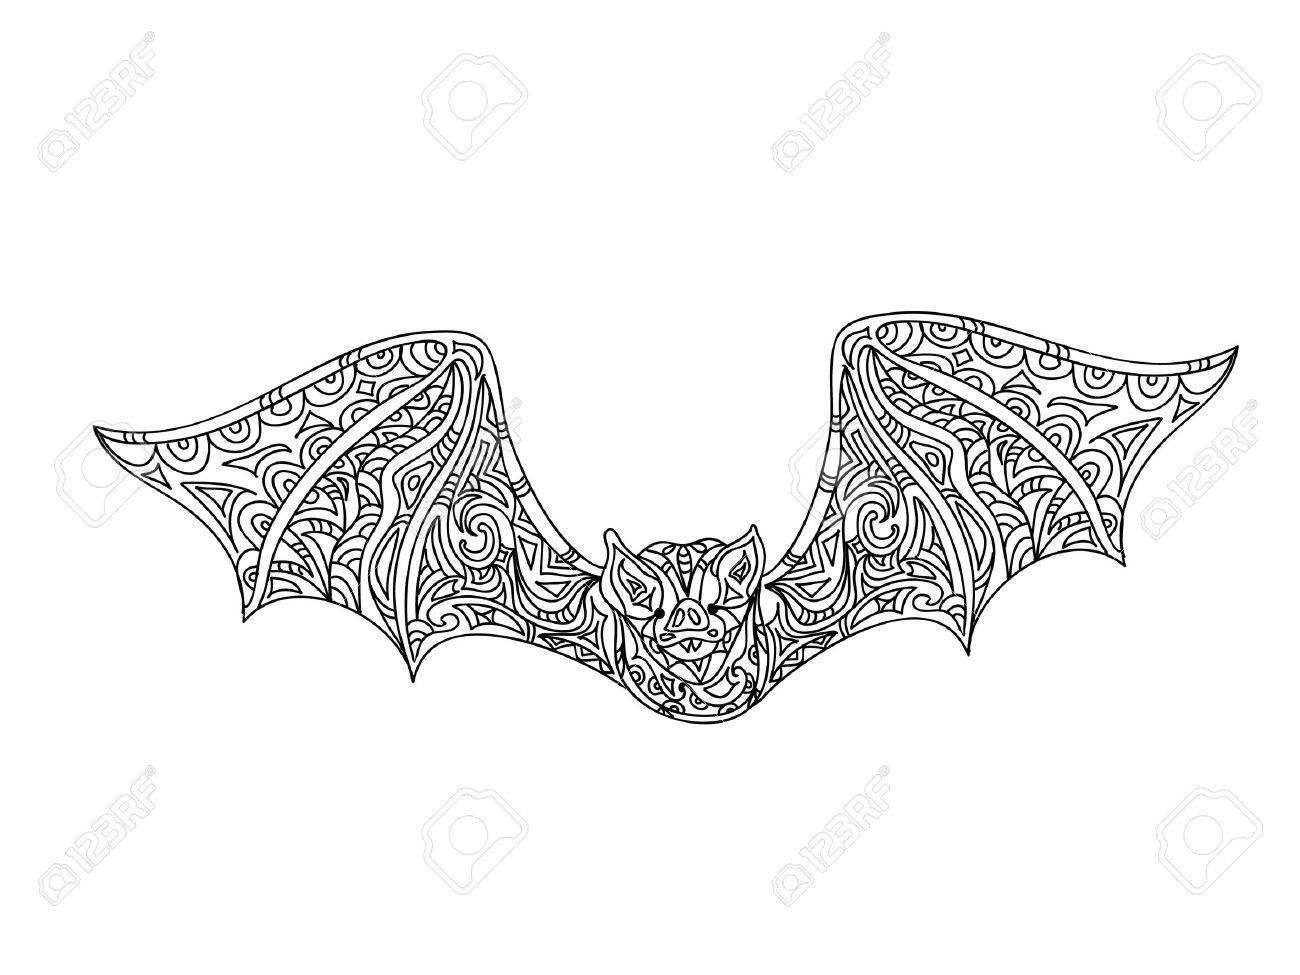 Bat Coloring Pages Coloring Coloring Pages